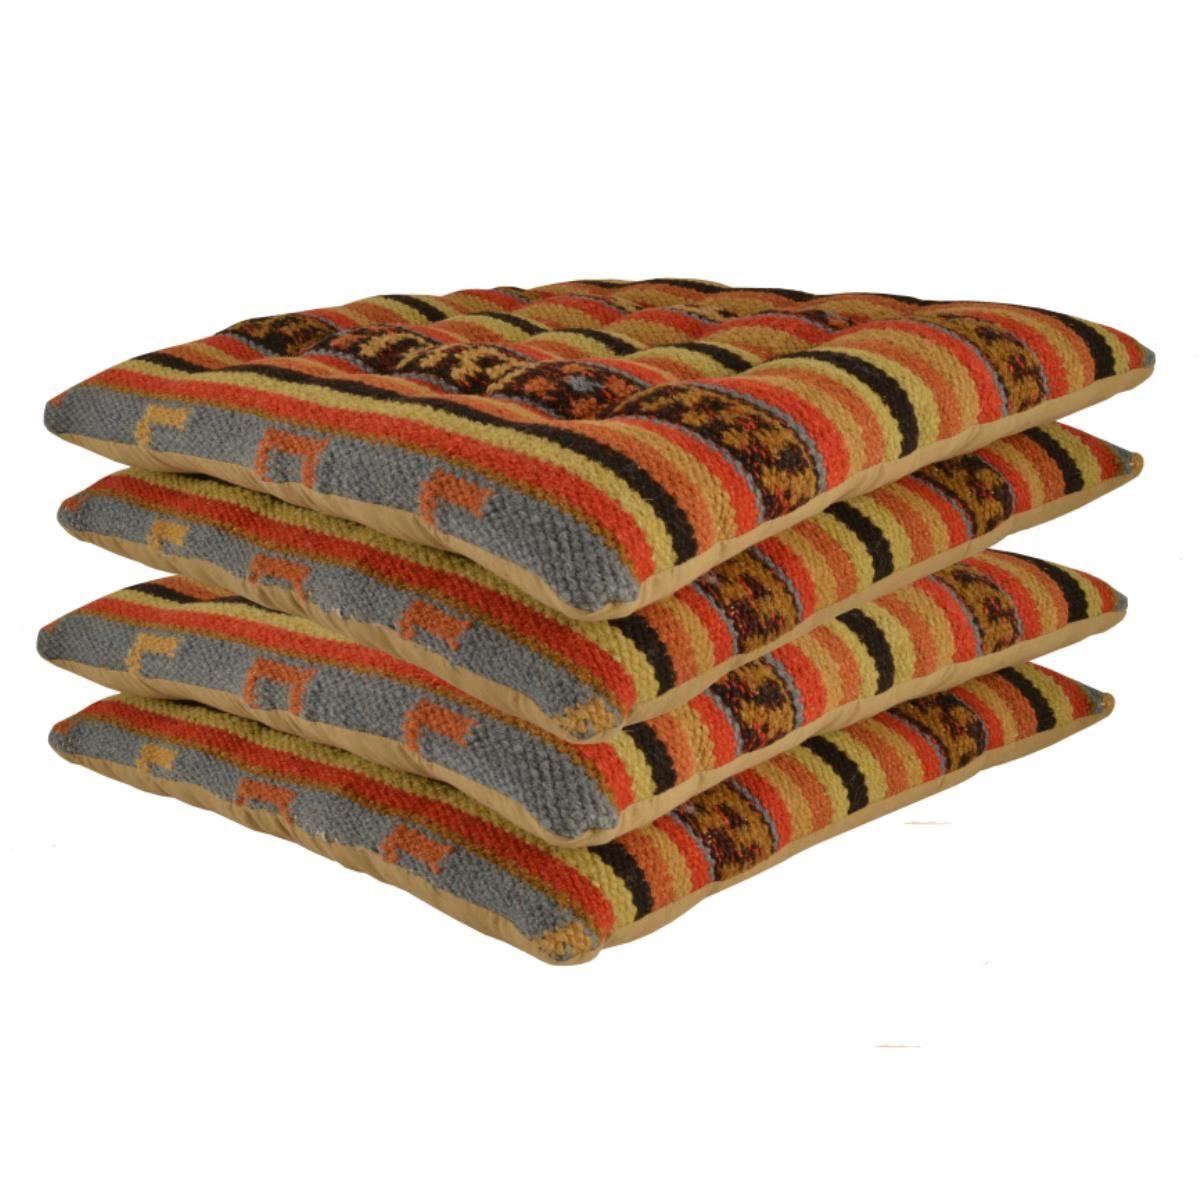 rohet wool kilim chair pad global fusion bedroom pinterest rh pinterest com